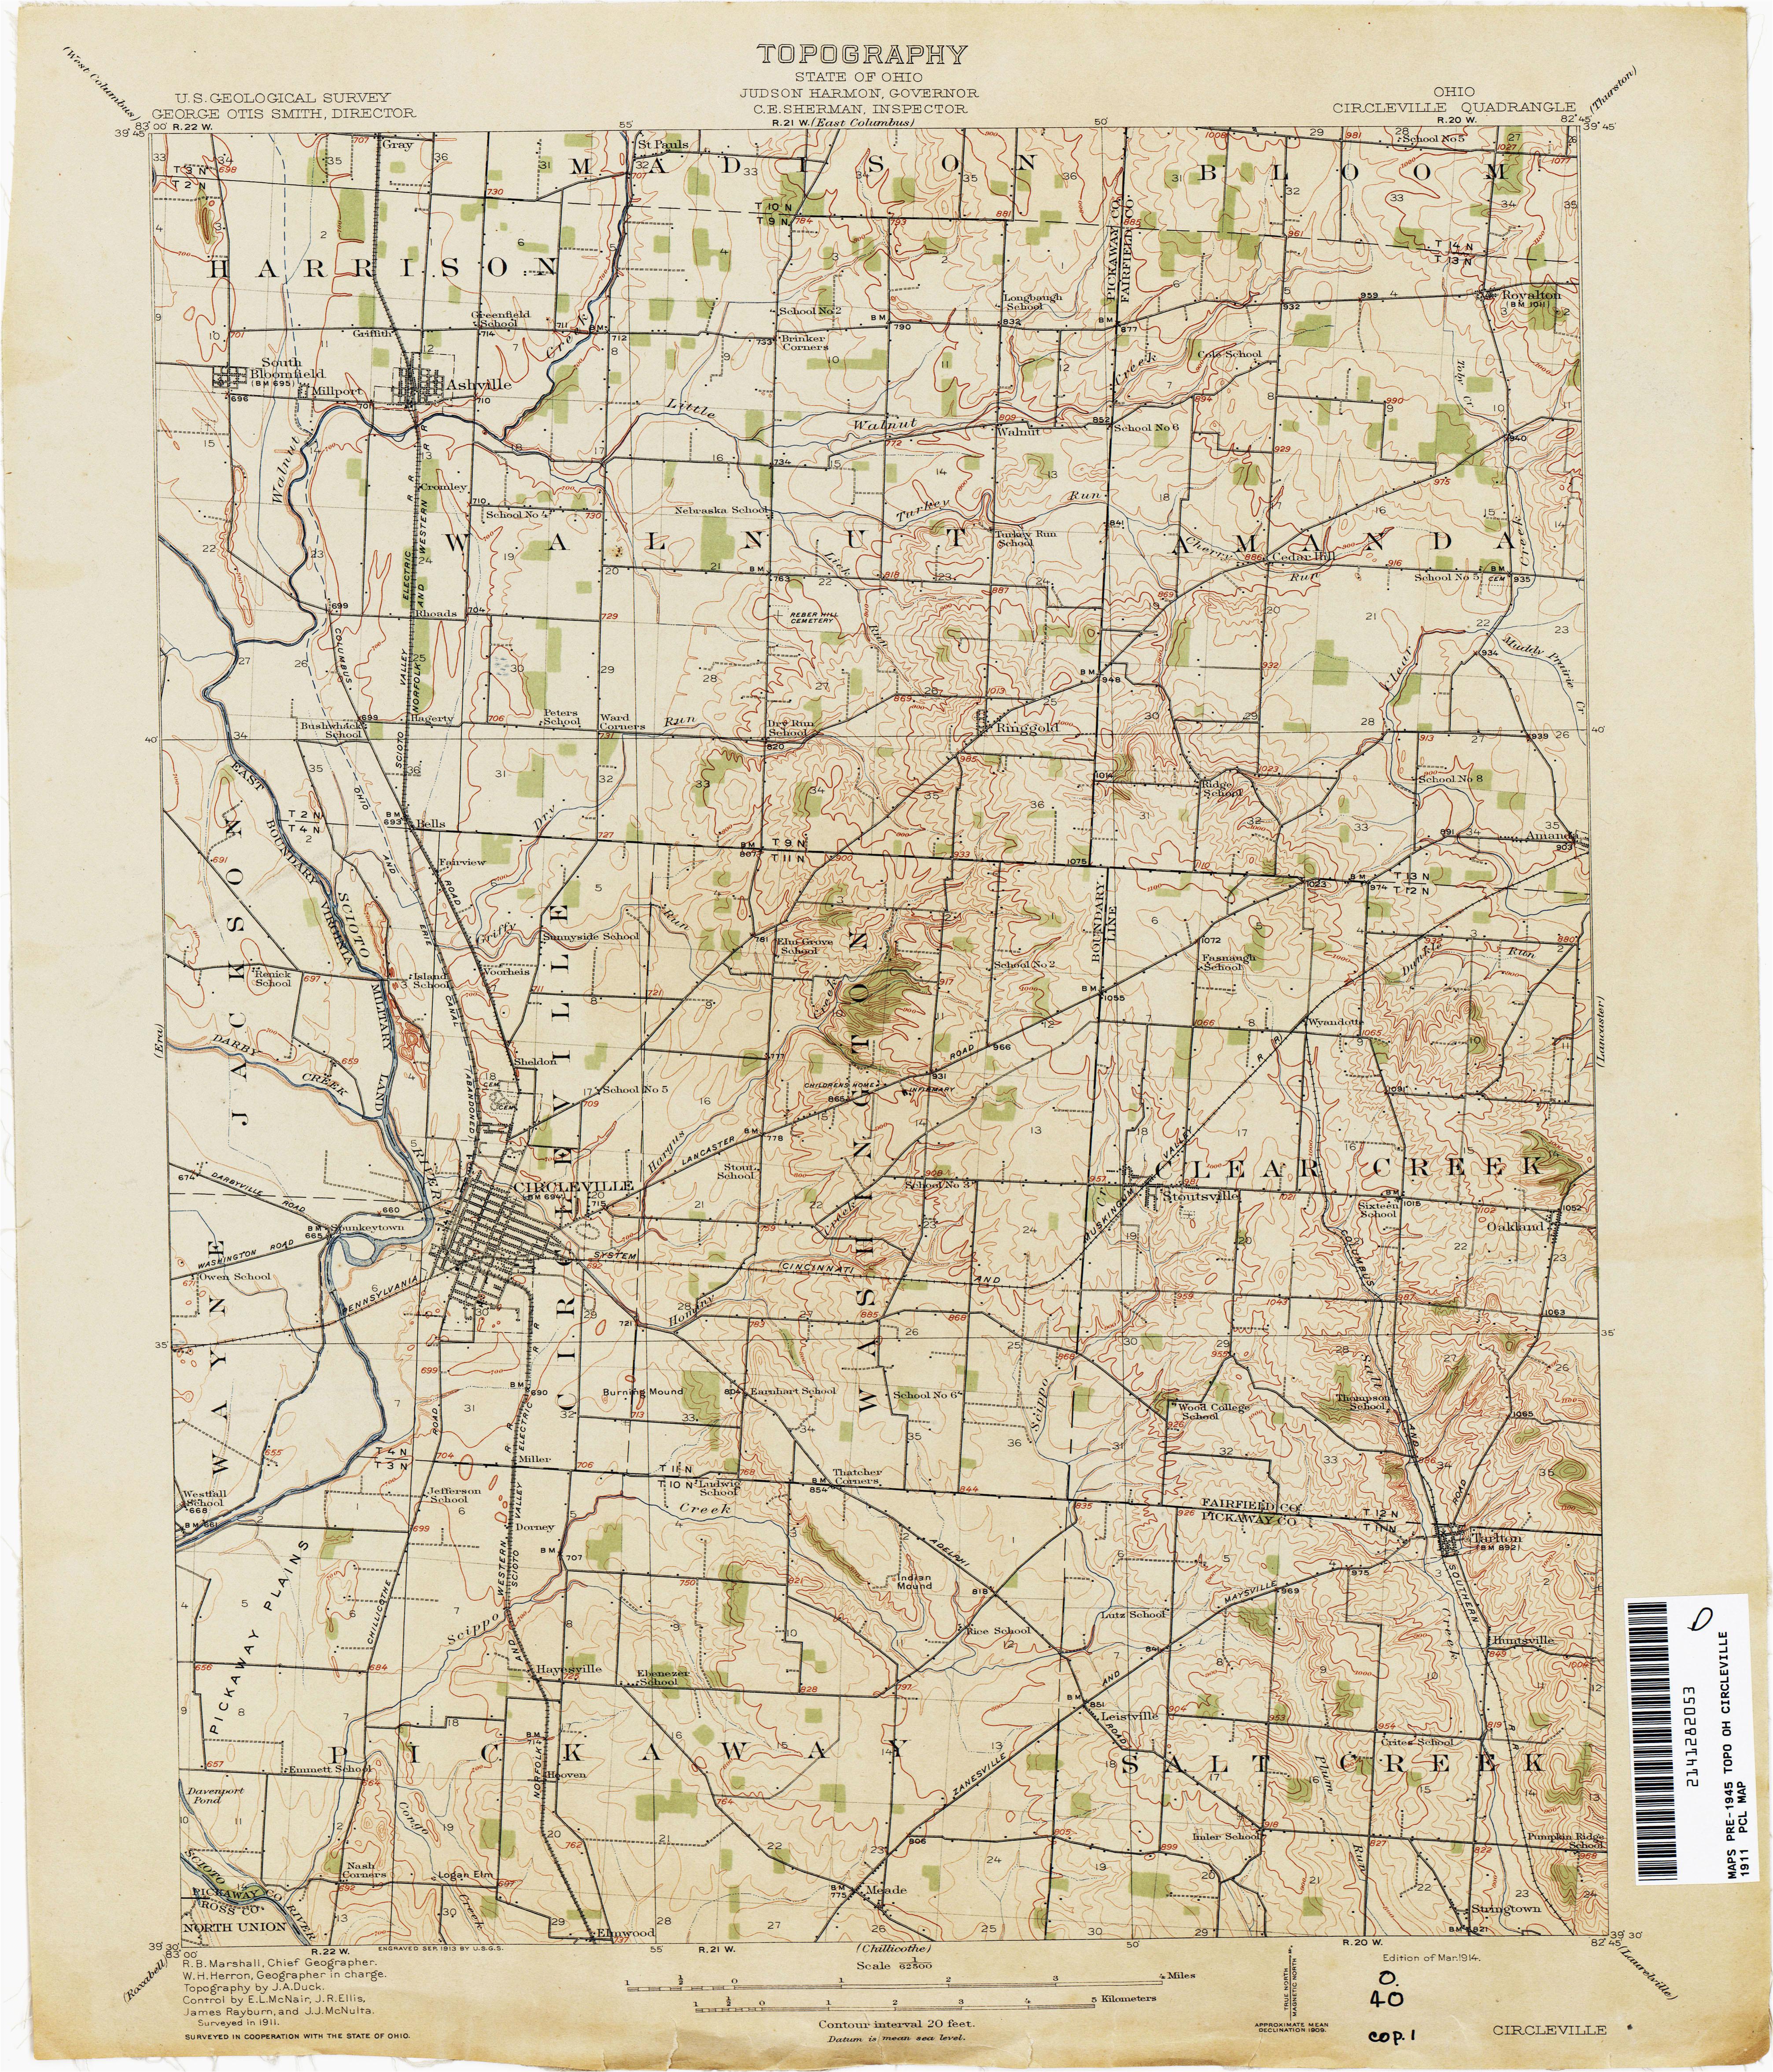 map of stark county ohio ohio historical topographic maps perry